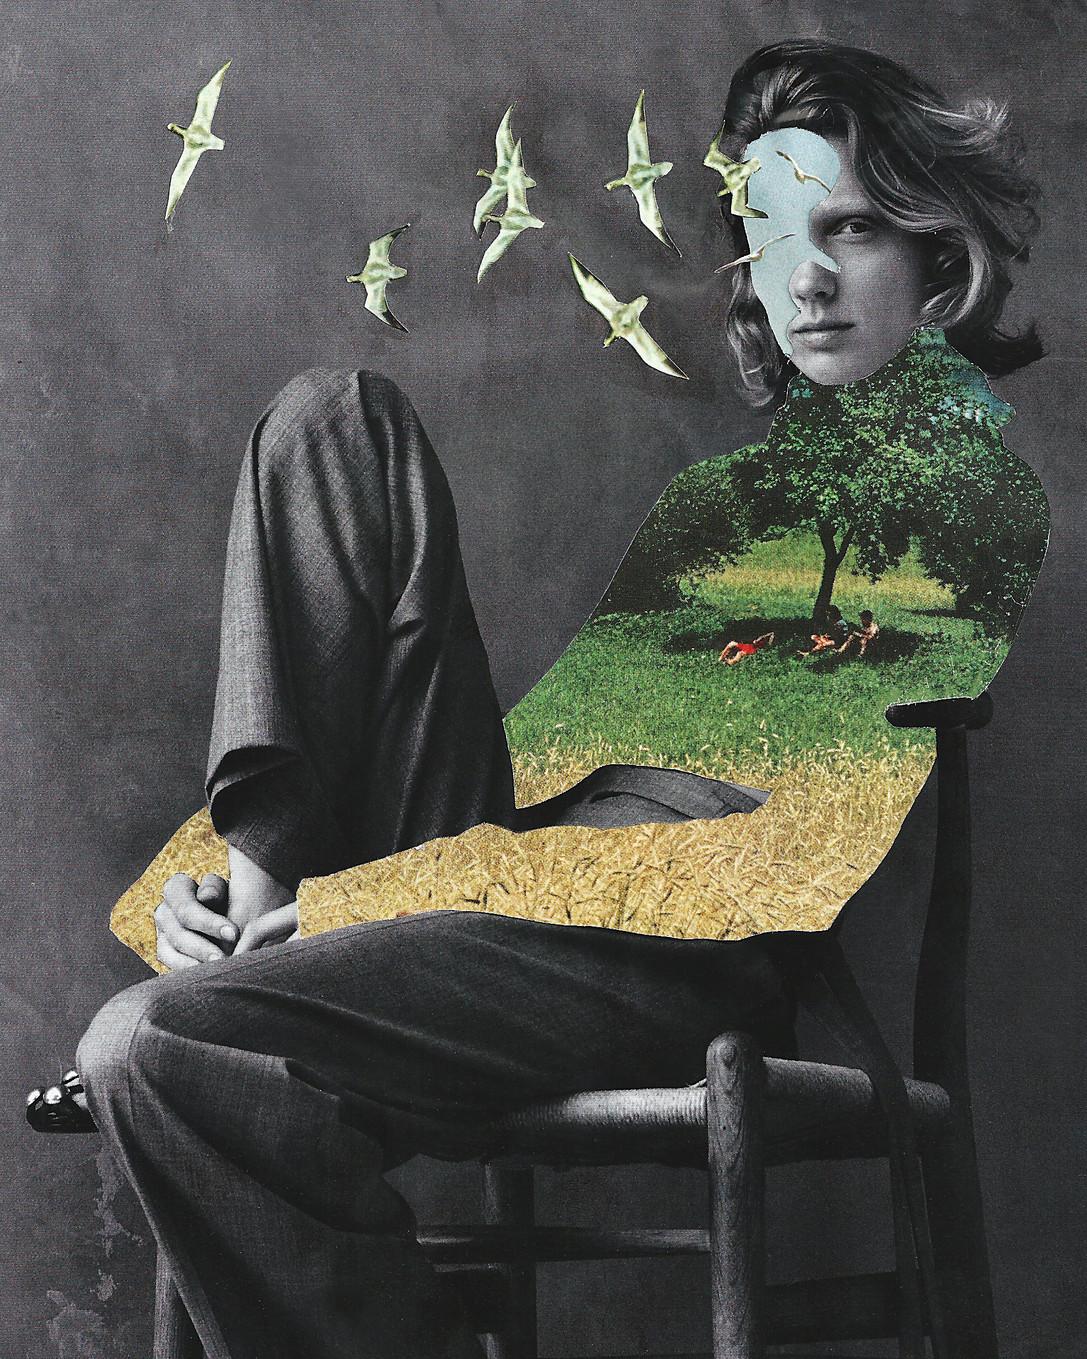 BirdBrain.Collage.jpg